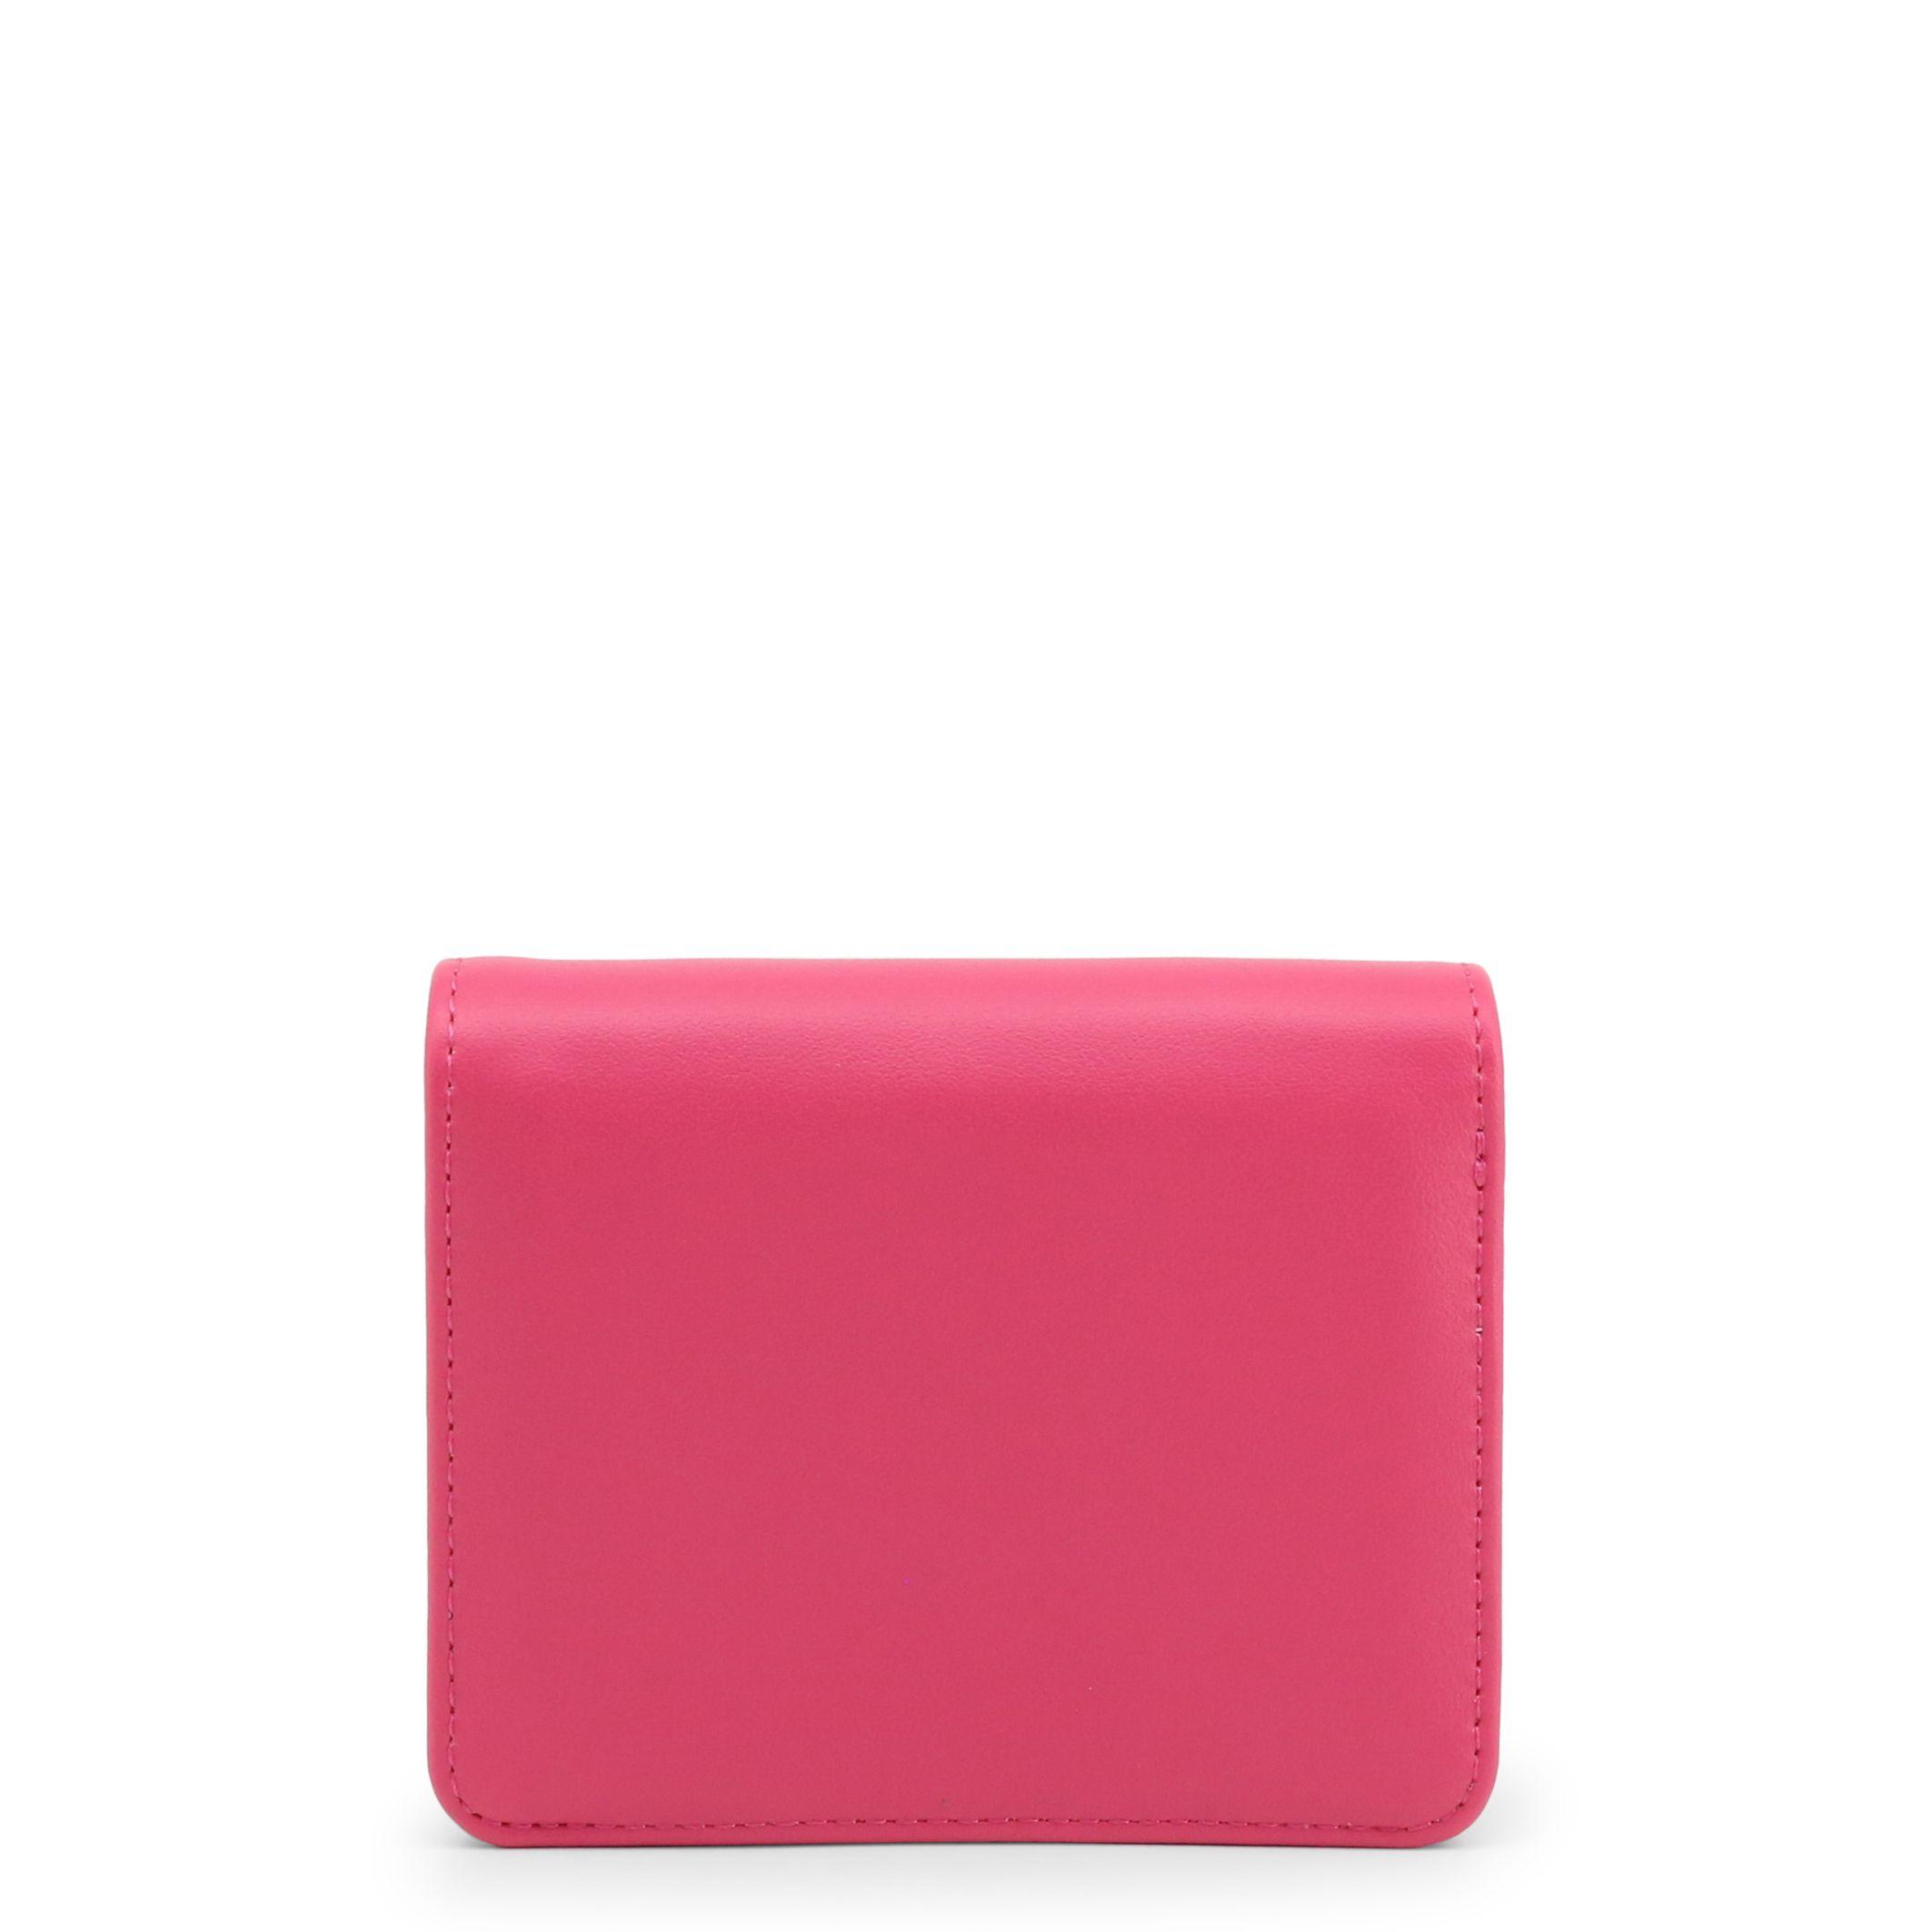 Bcb50F20 8B27 11Eb Abbe 756064413543 Love Moschino - Jc5625Pp1Clf0 - Pink